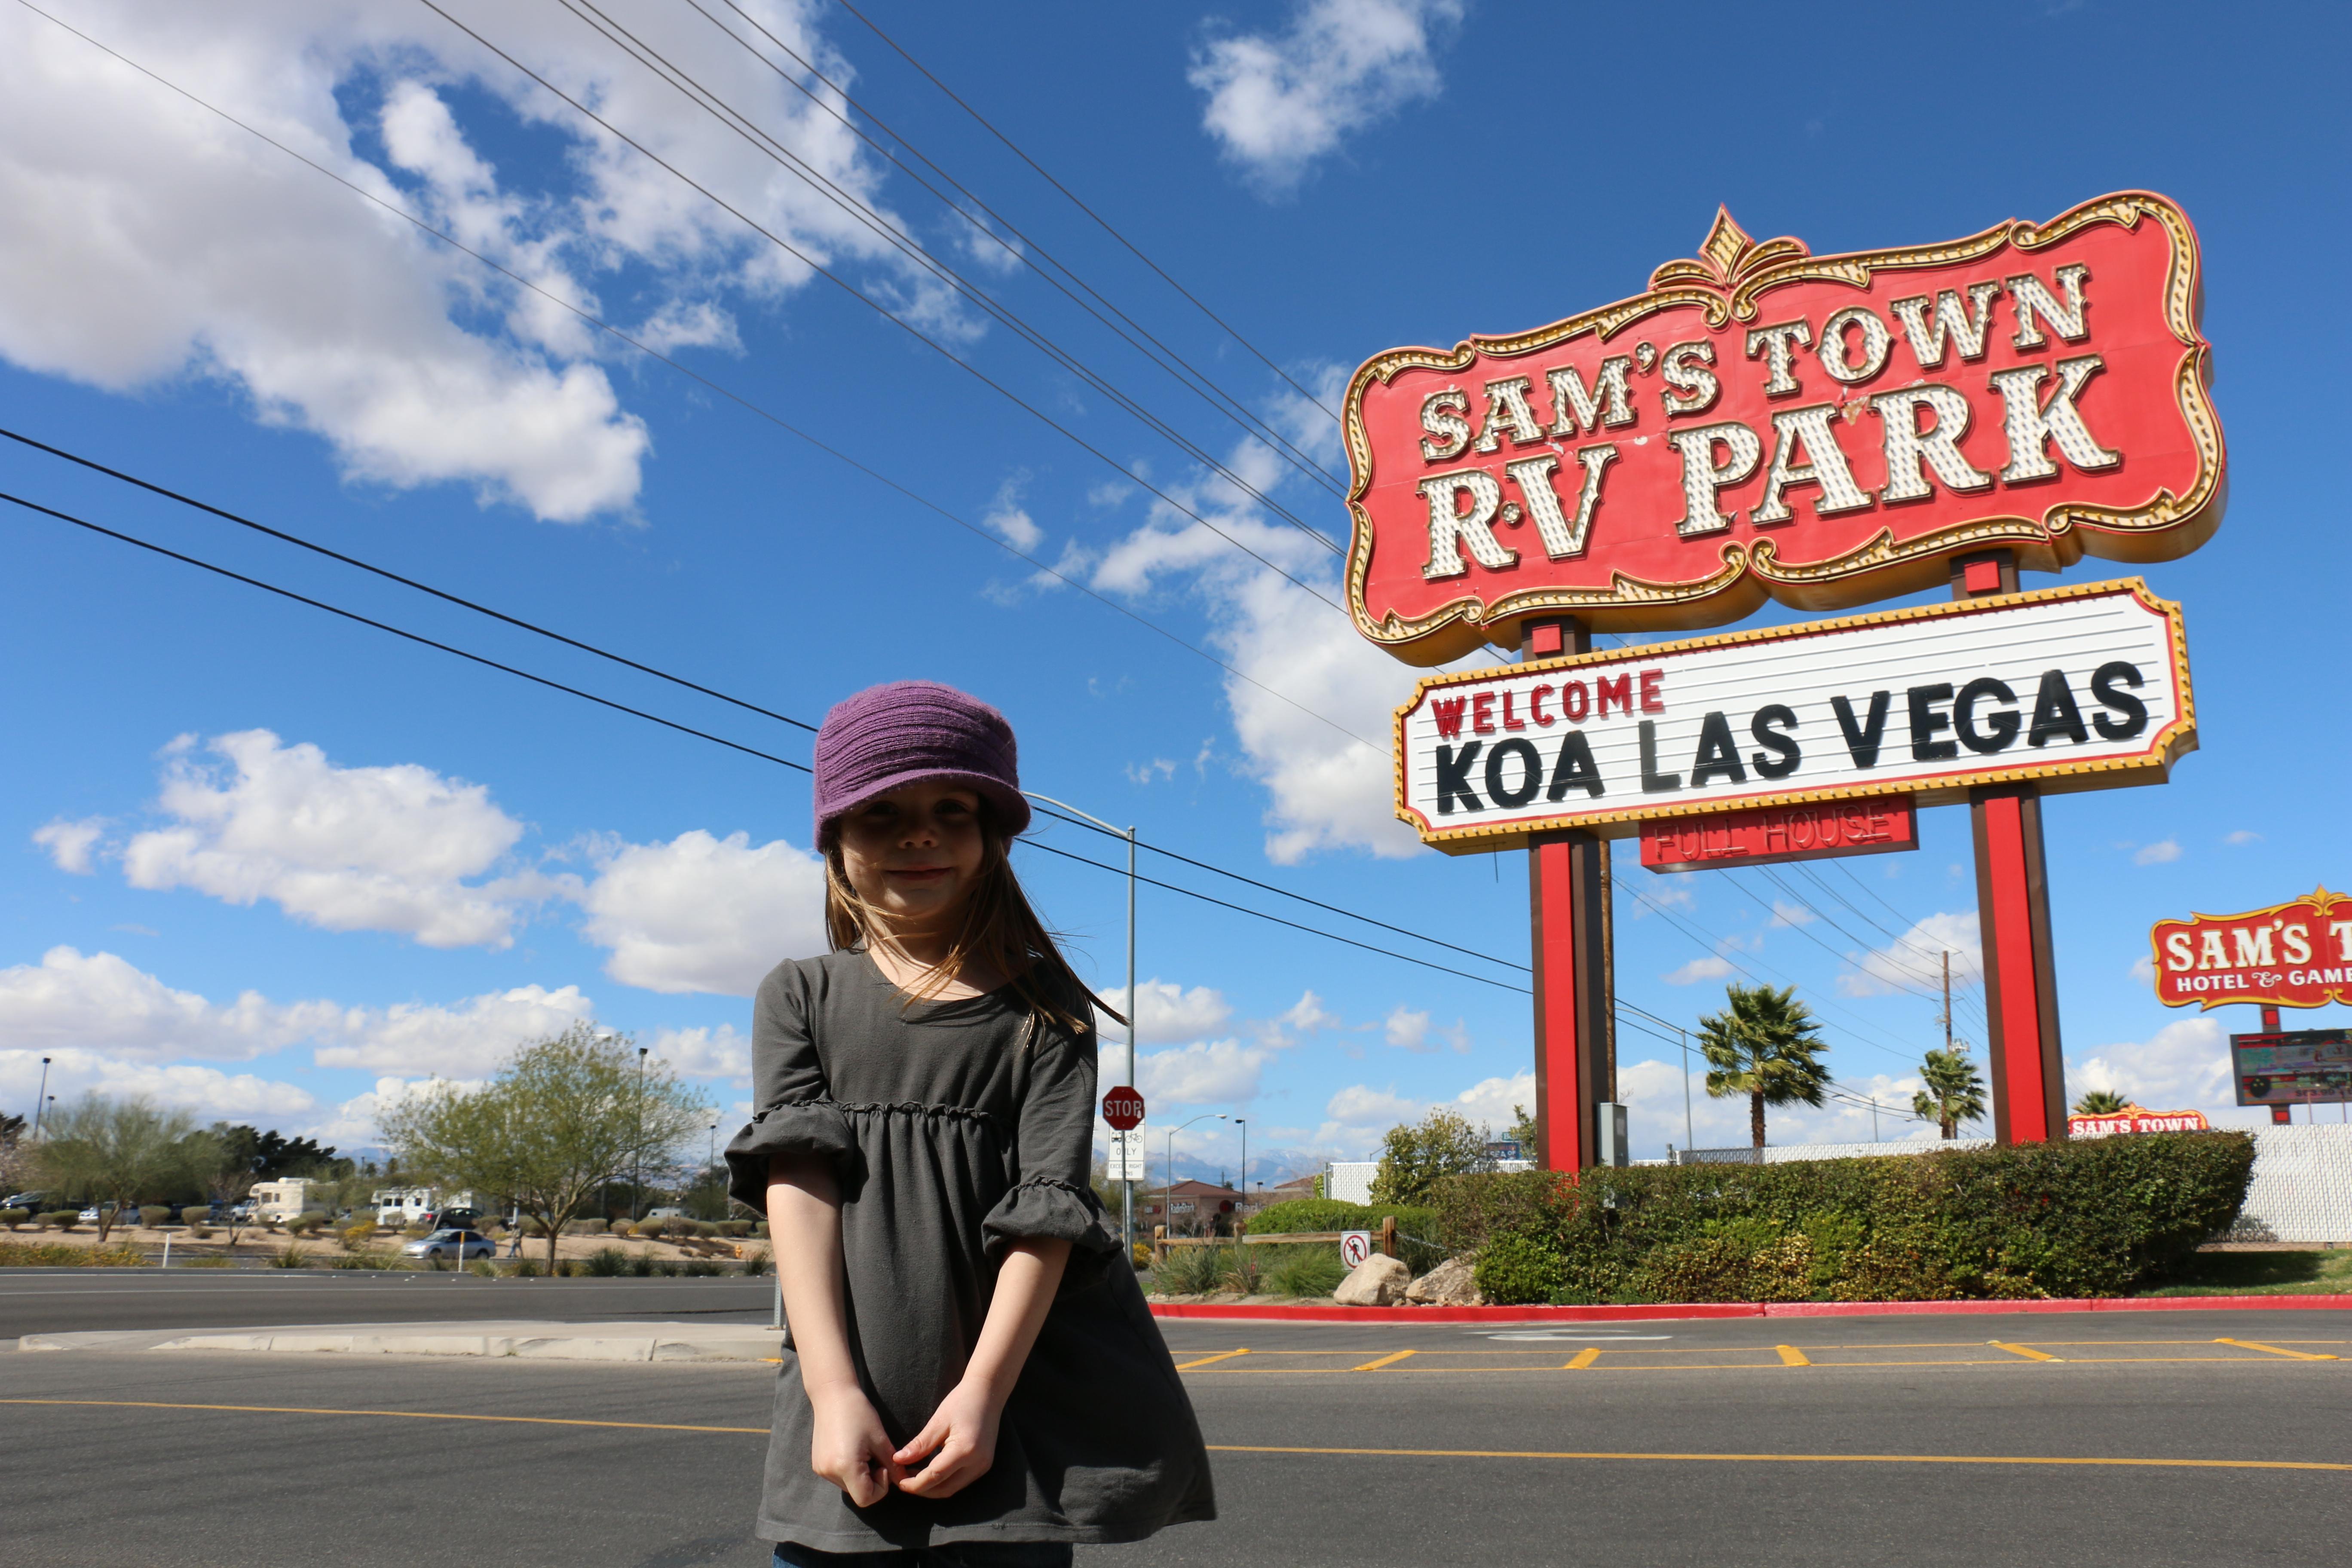 Day 8- Las Vegas